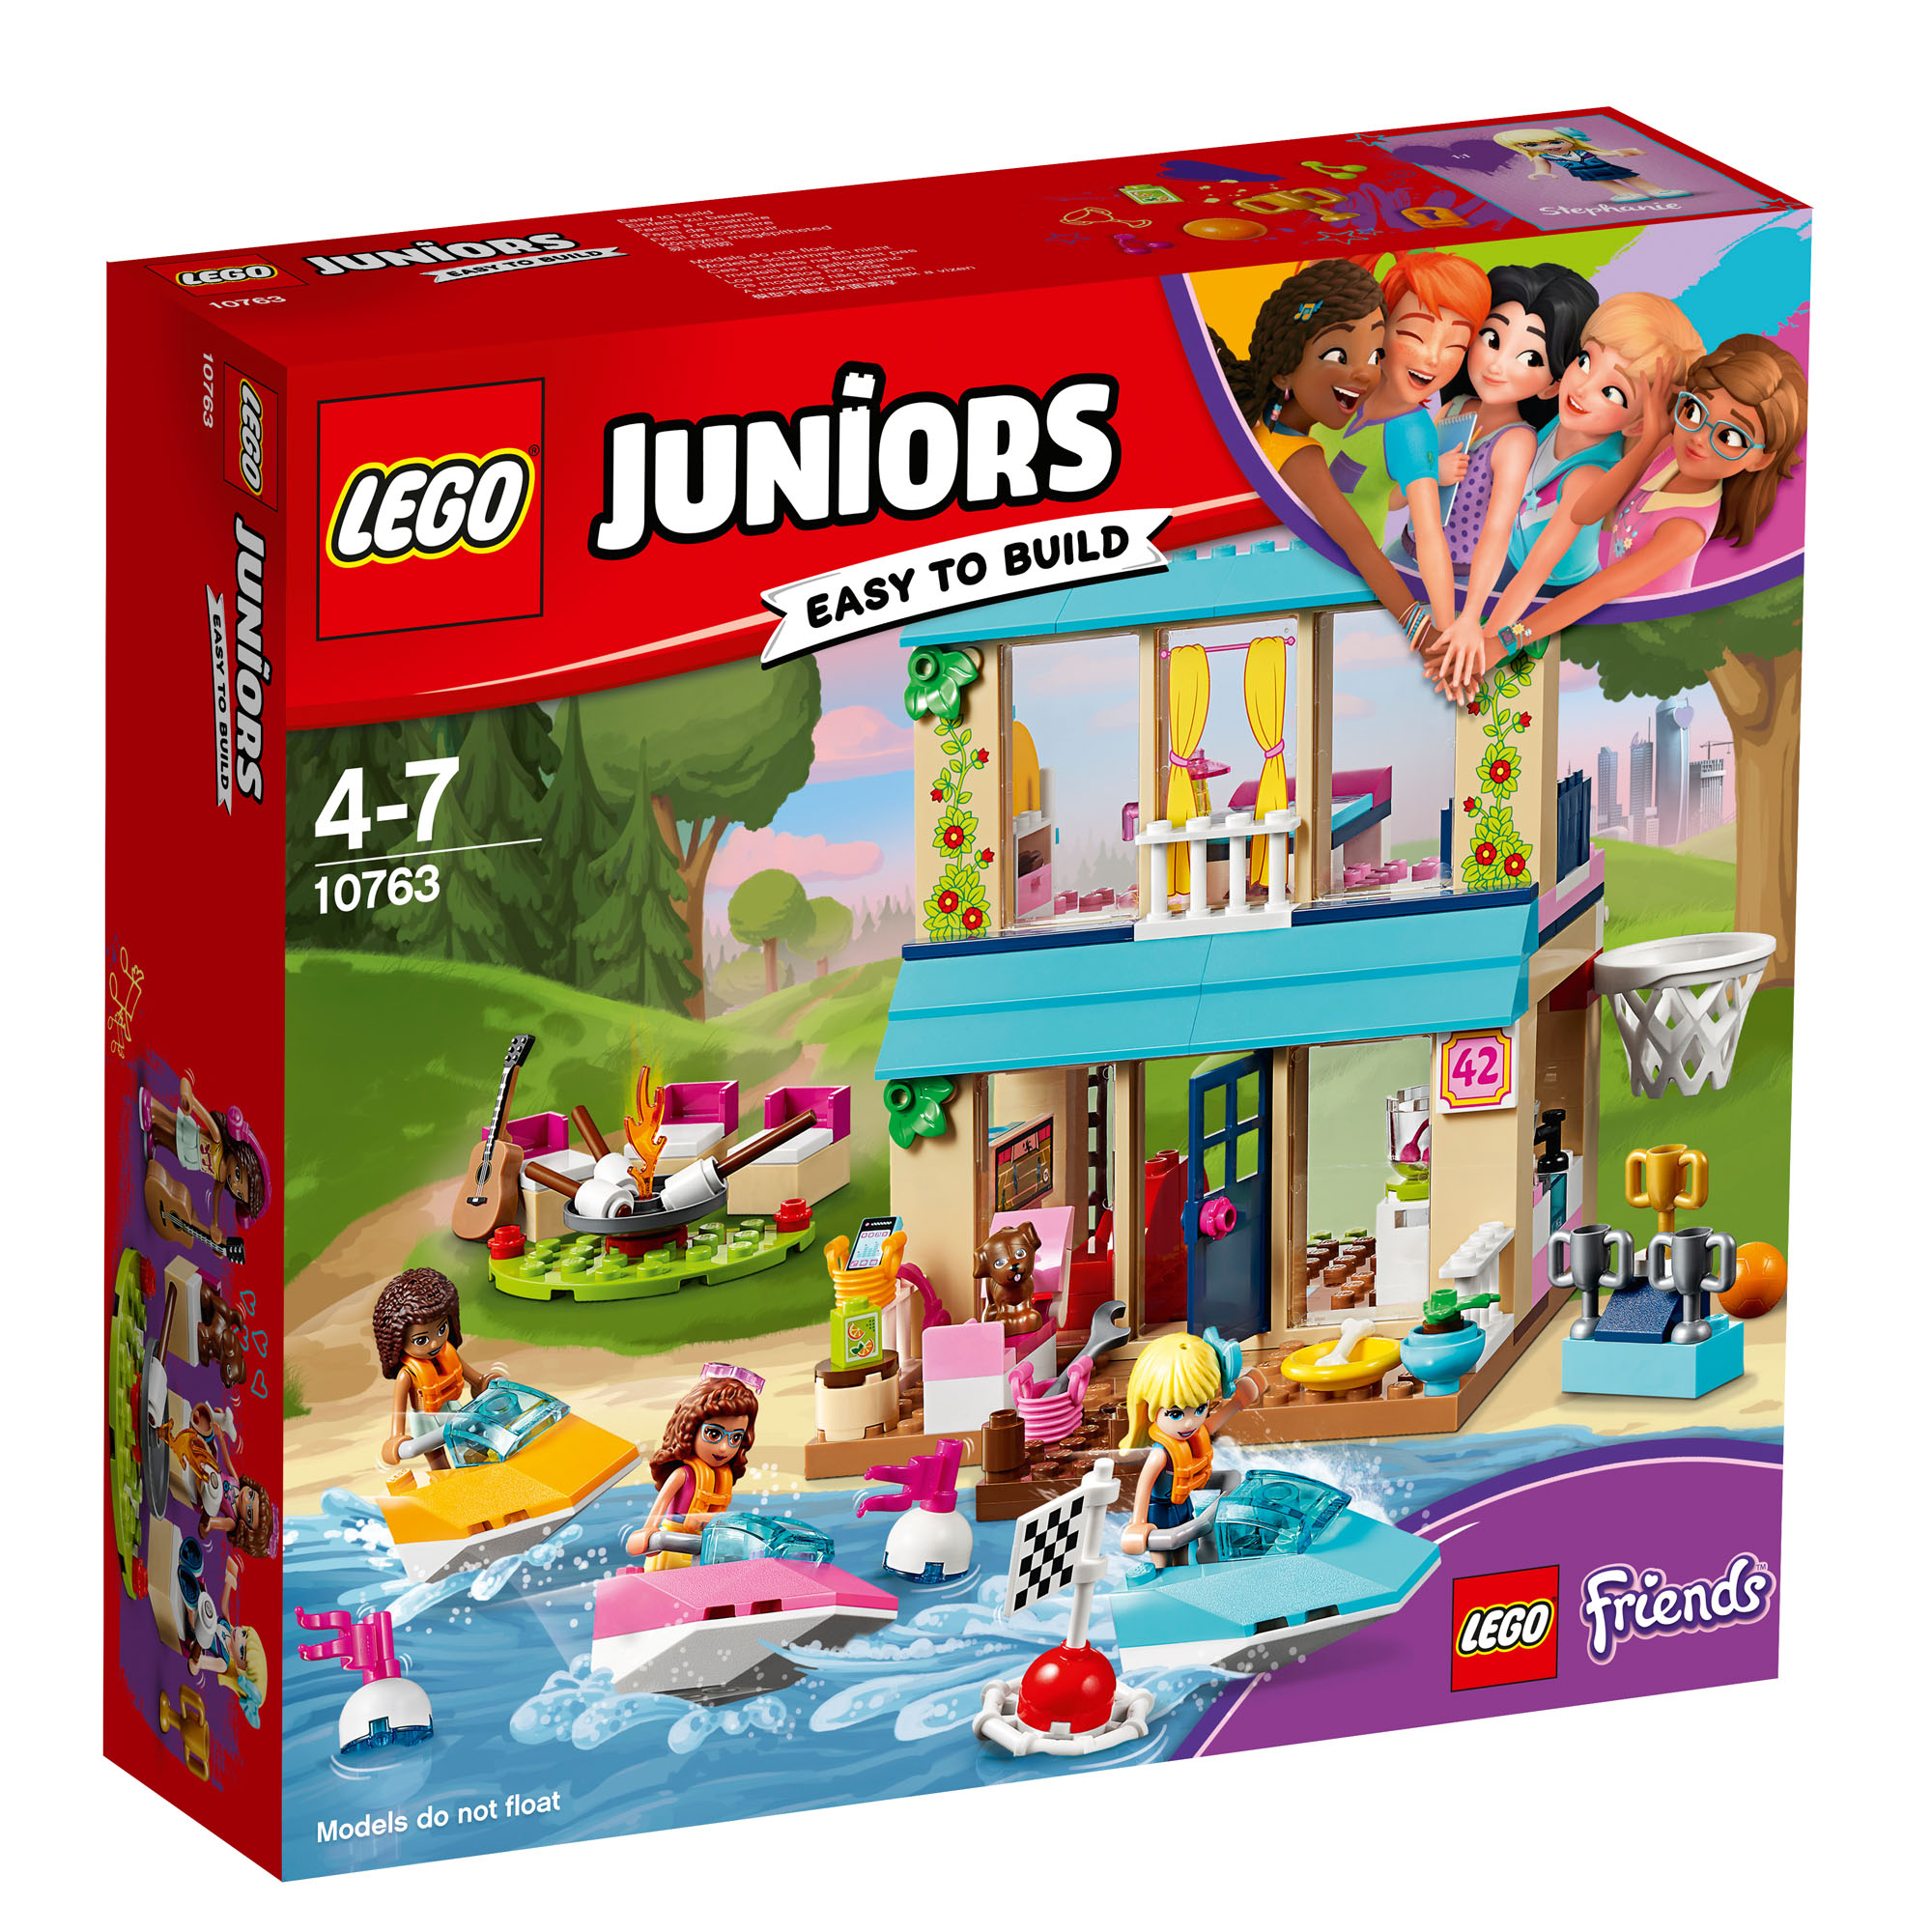 10763 lego juniors friends stephanie's lakeside house 215